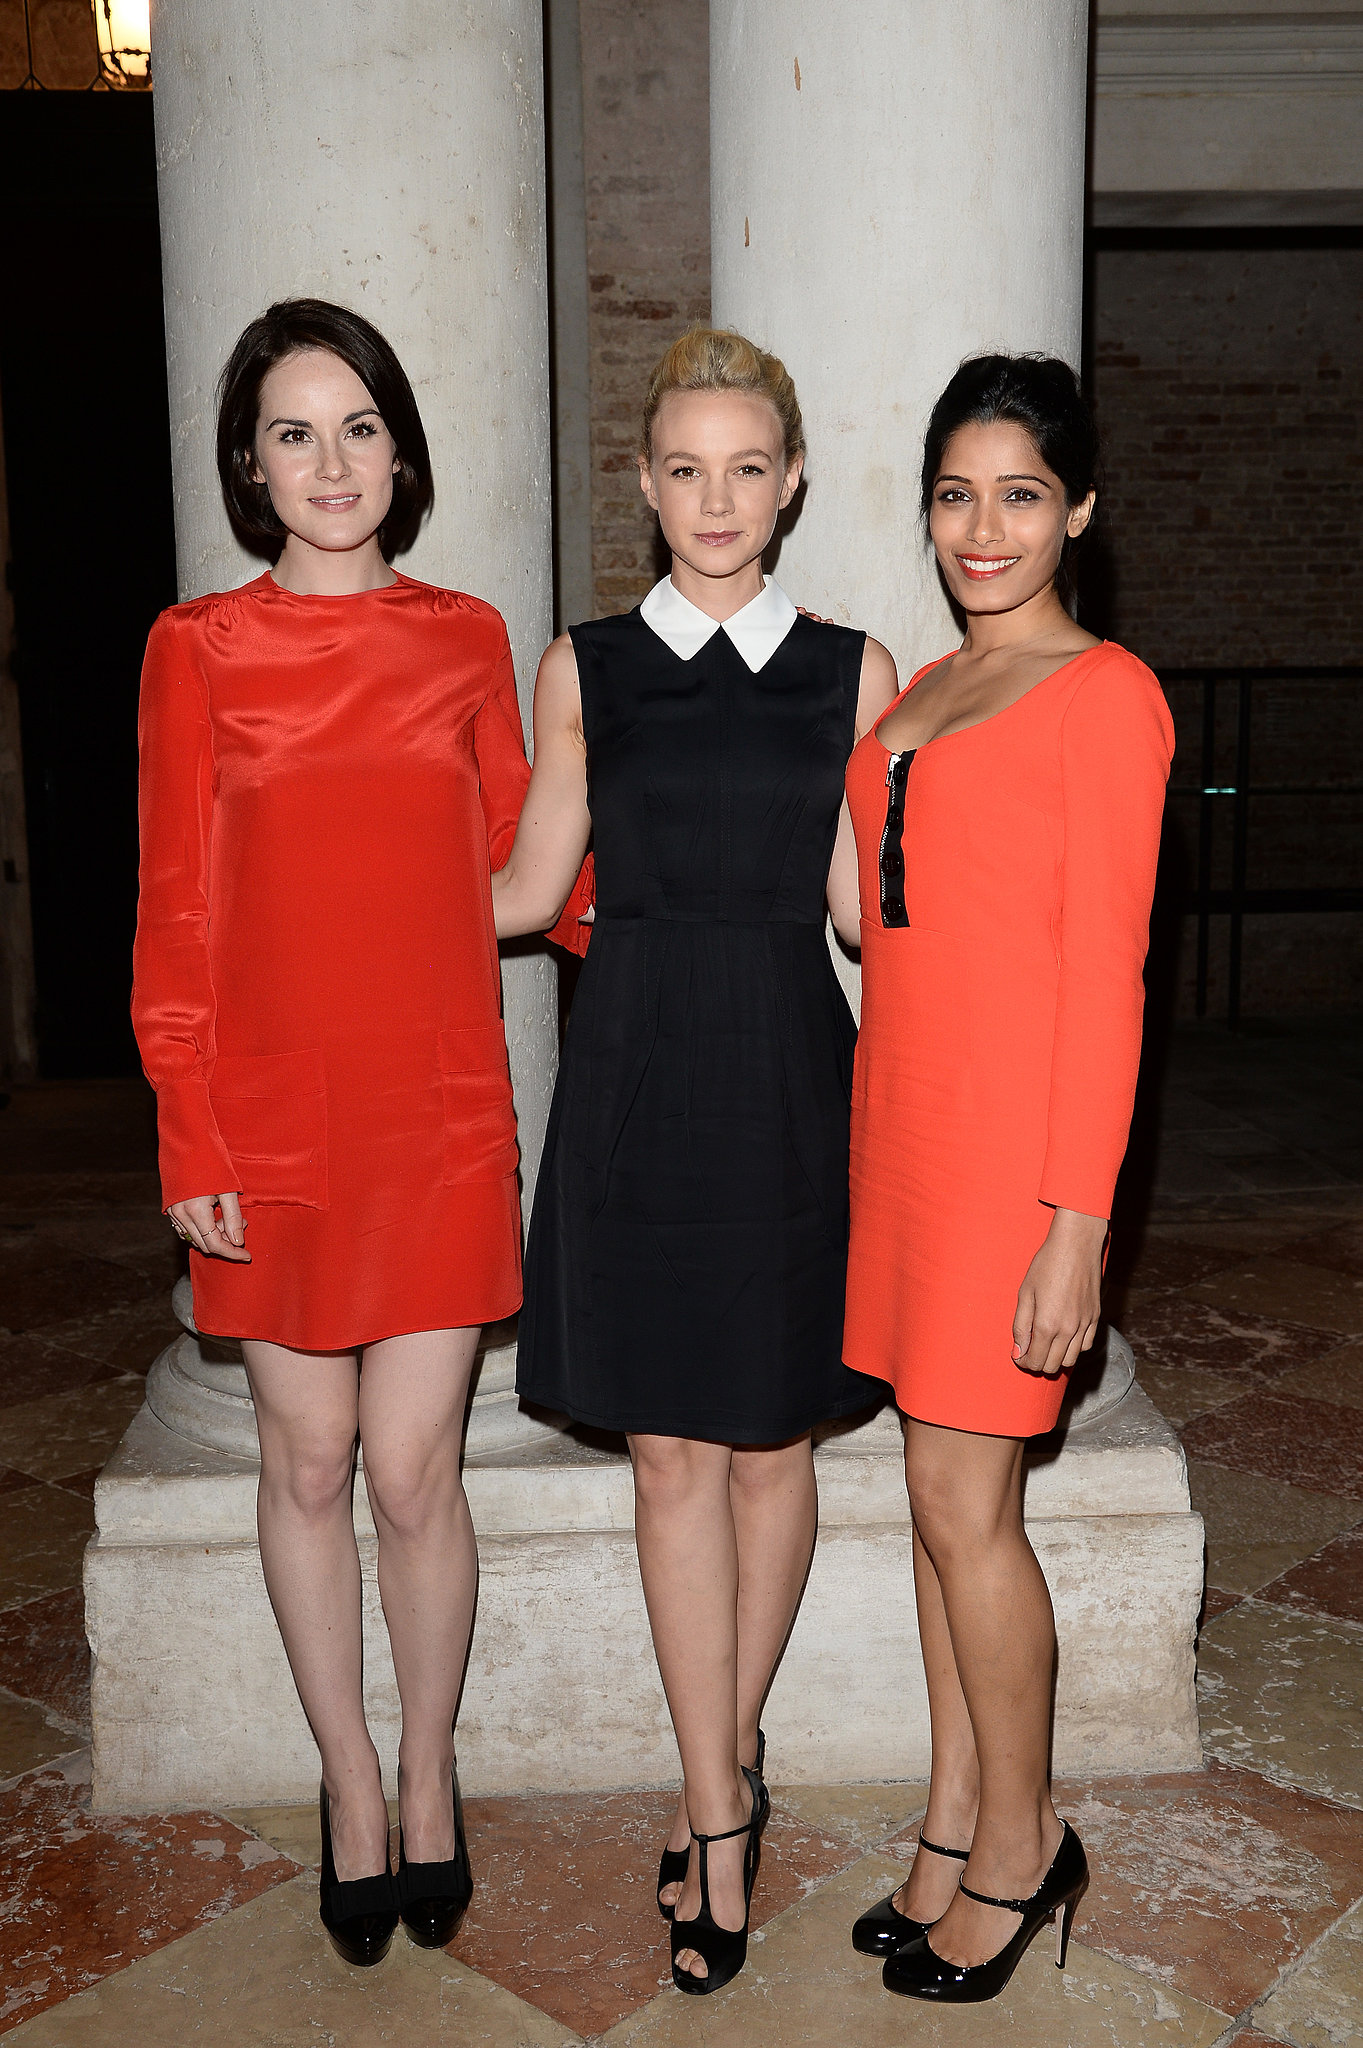 Michelle Dockery, Carey Mulligan, and Freida Pinto attended the Miu Miu Women's Tales dinner.